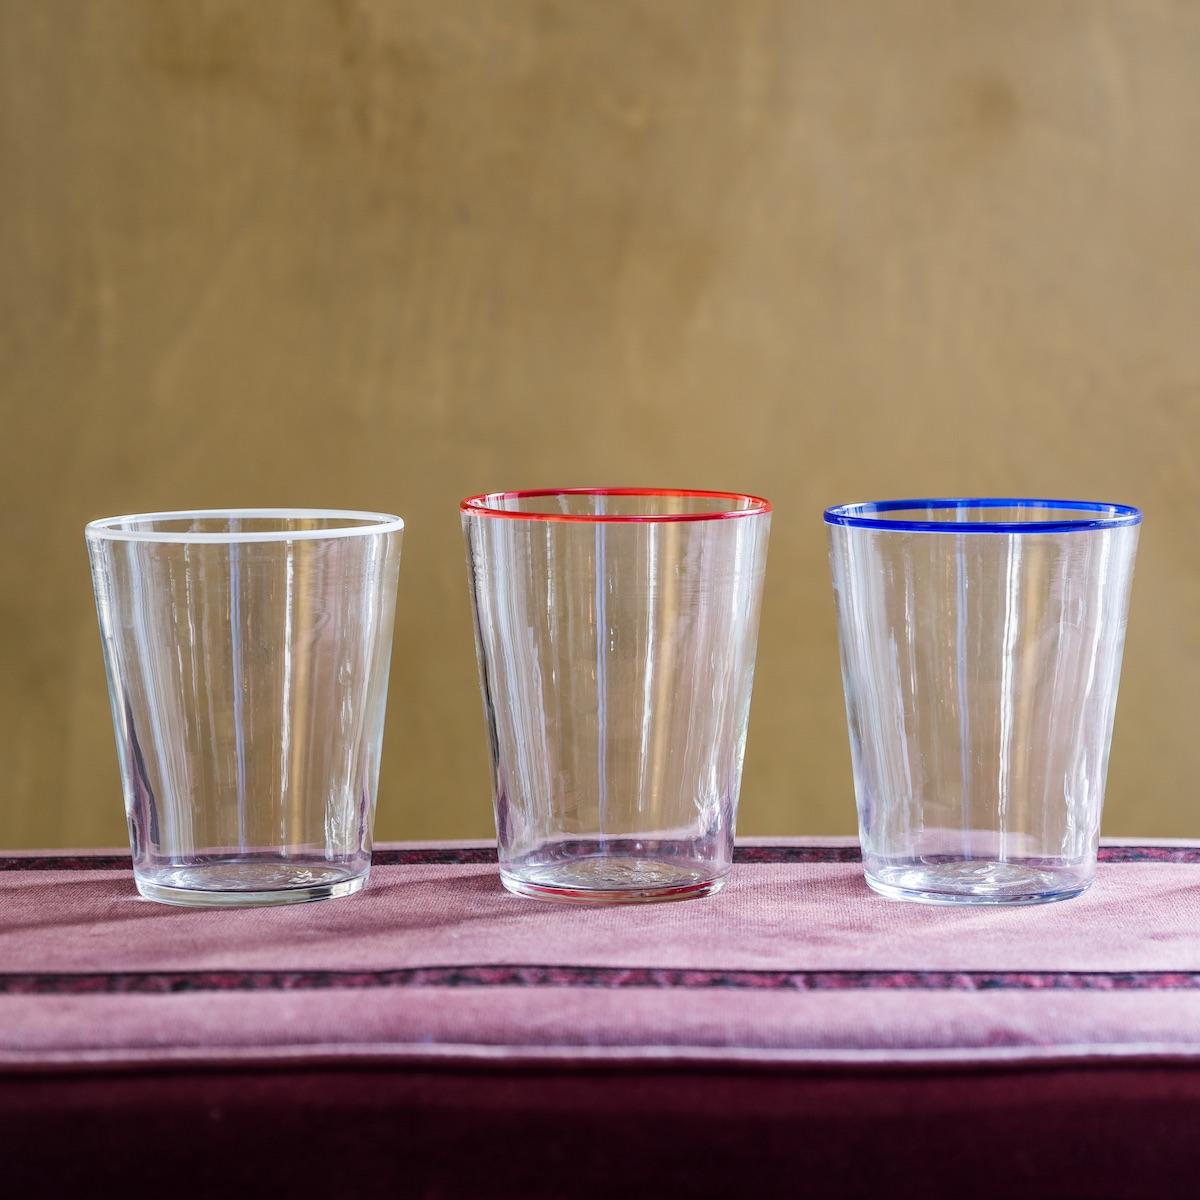 summer-glasses-perfect-luxury-fun-glass-italian-designer-venice